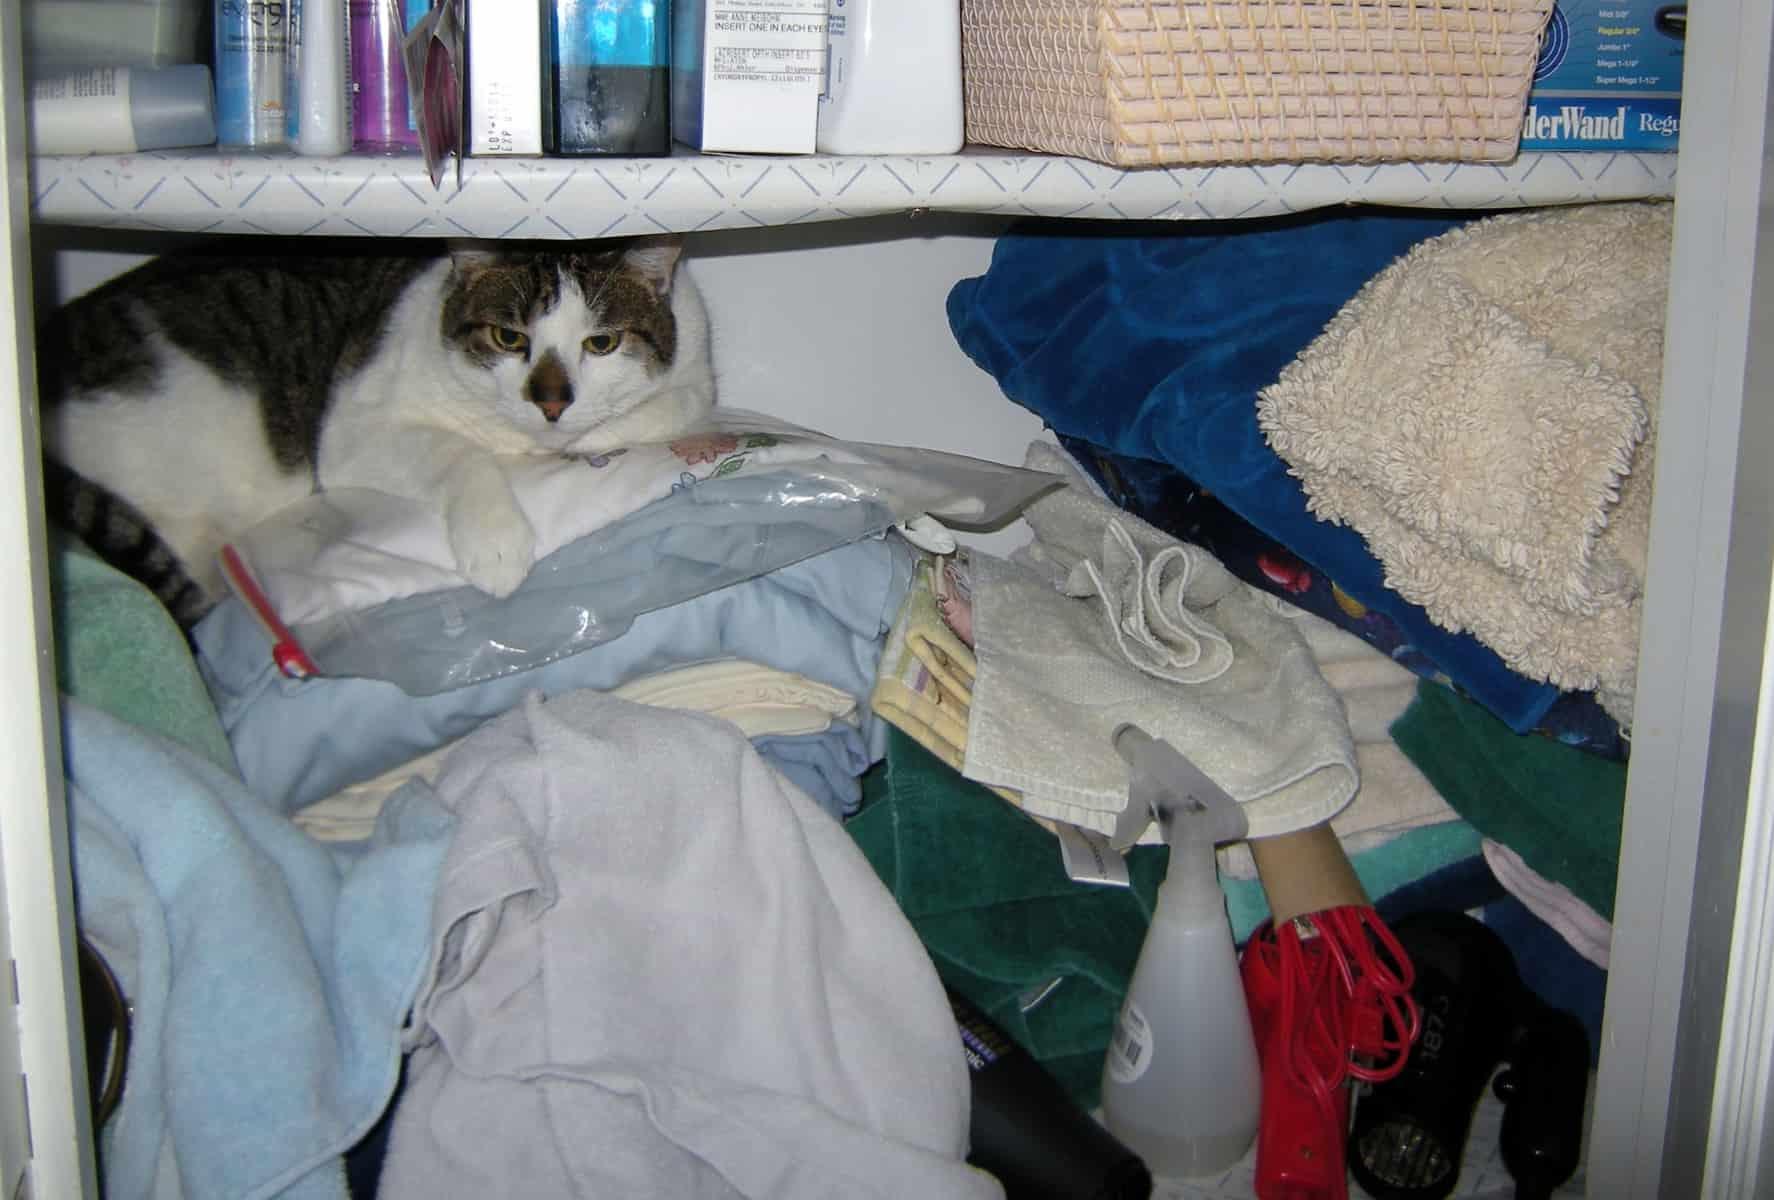 Smudge Helping Me Organize A Linen Closet